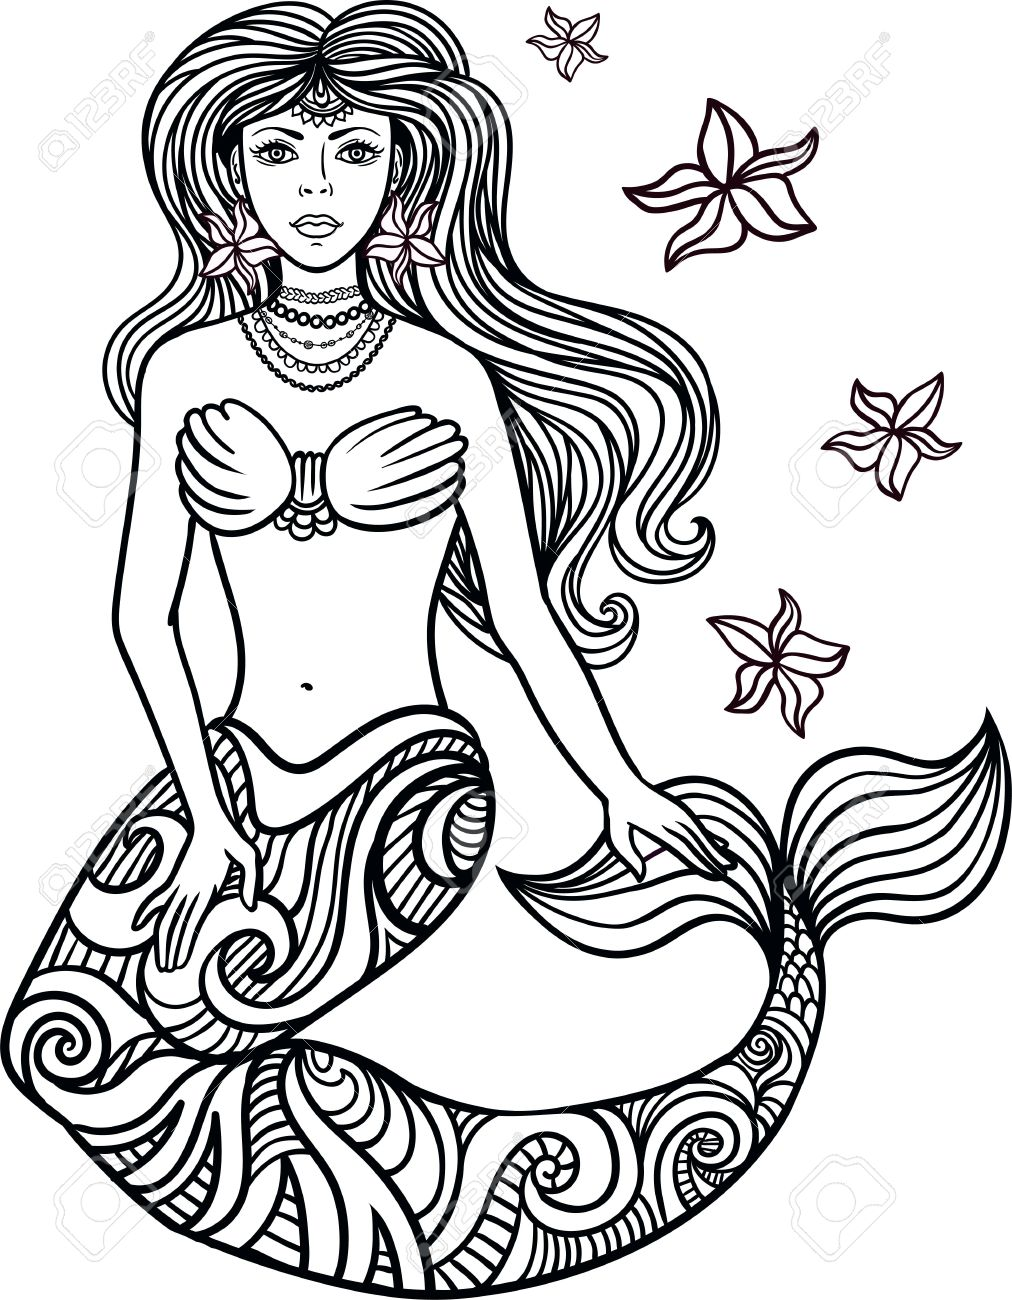 1012x1300 Hand Drawn Beautiful Artwork Mermaid With Curly Hair, Algae